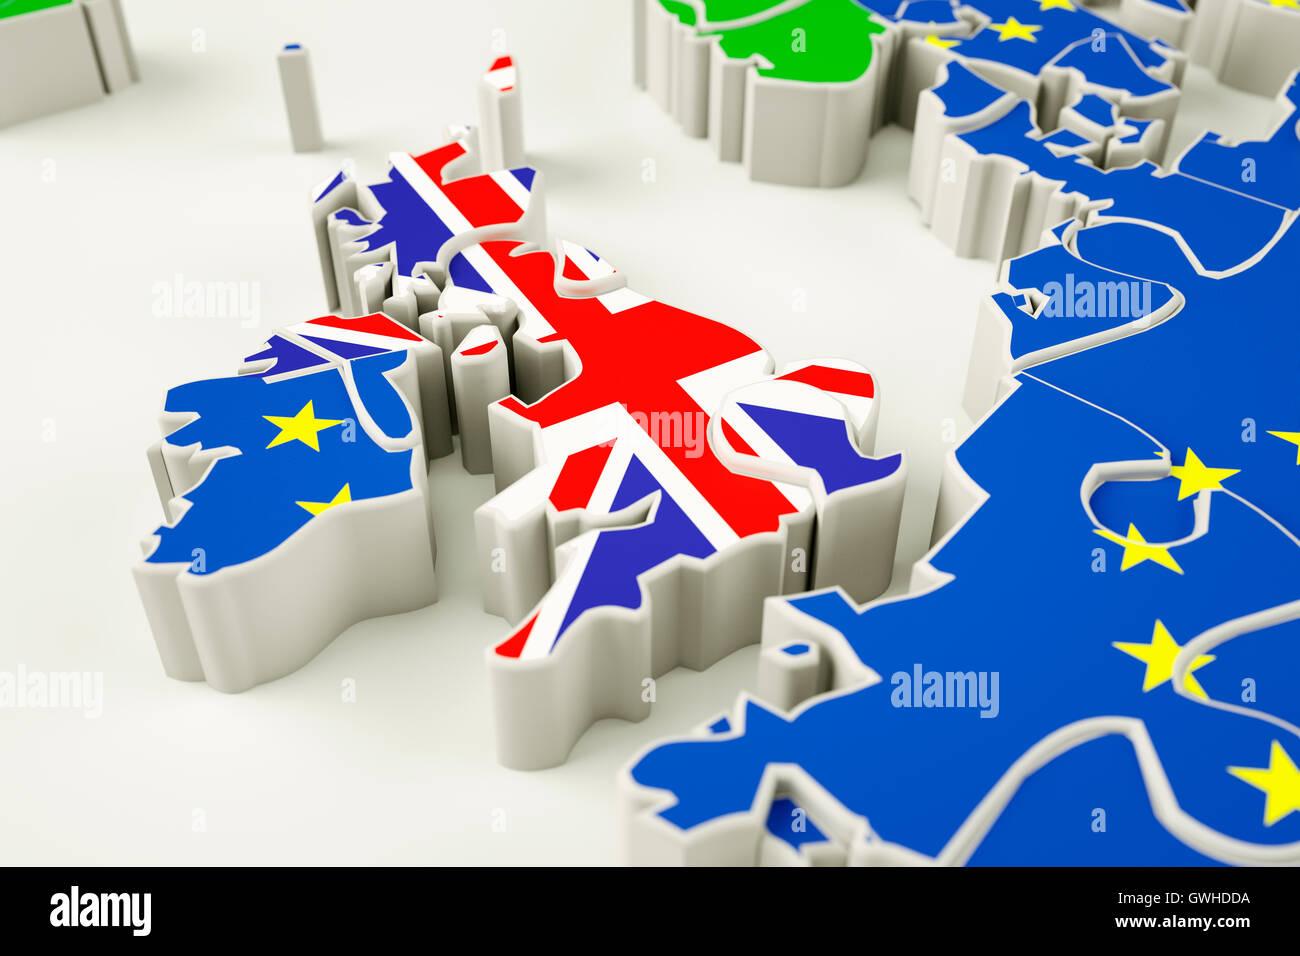 Brexit concept puzzle - representing Brexit, EU referendum, UK exit, single market etc. - Stock Image